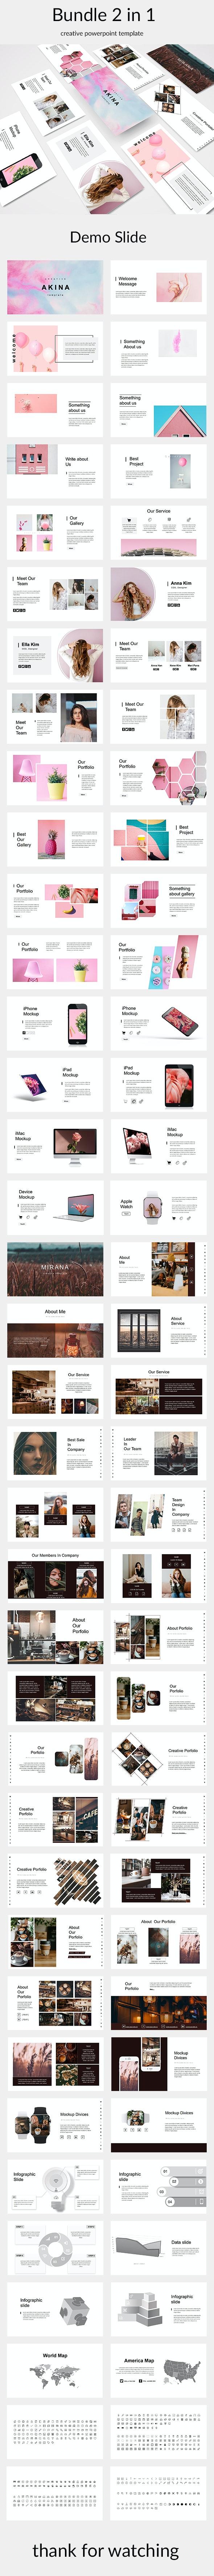 2 in 1 Premium - Apri 1 Creative Powerpoint Template - Creative PowerPoint Templates